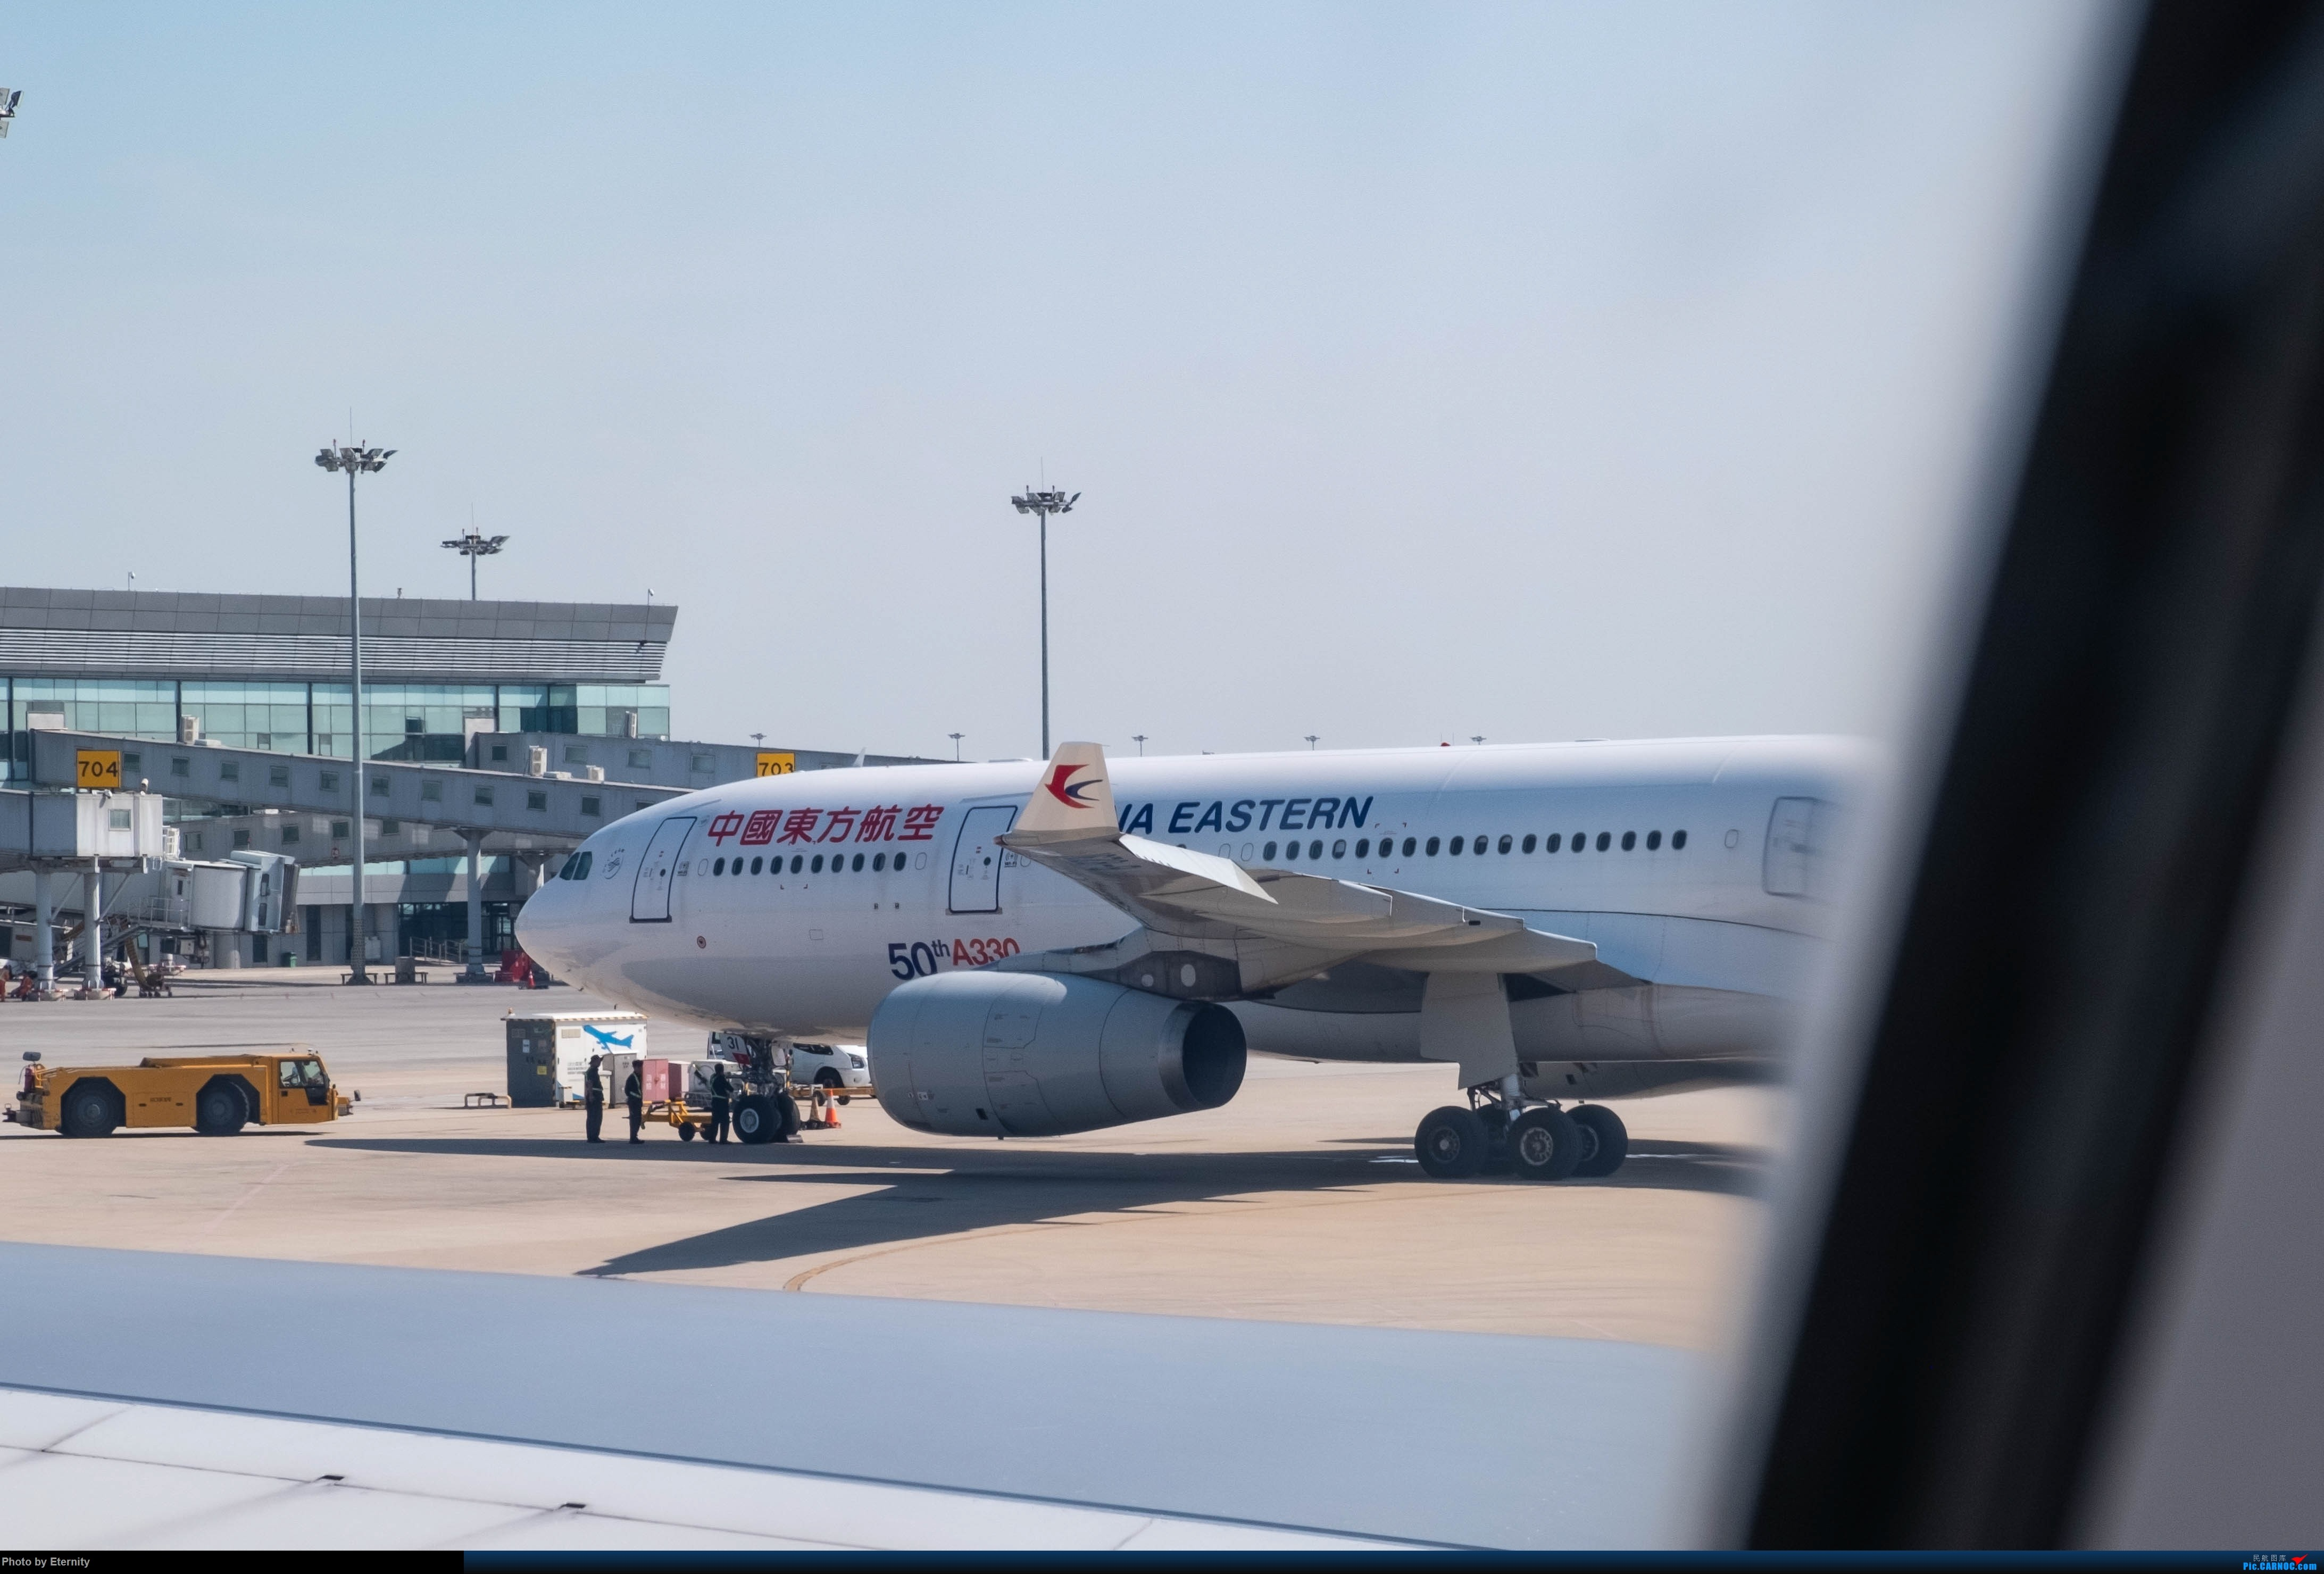 Re:[原创]上集|台铁环岛游台湾|一路兜兜转转|西安-香港-台北 CX/KA往返 AIRBUS A330-200 B-8231 中国西安咸阳国际机场